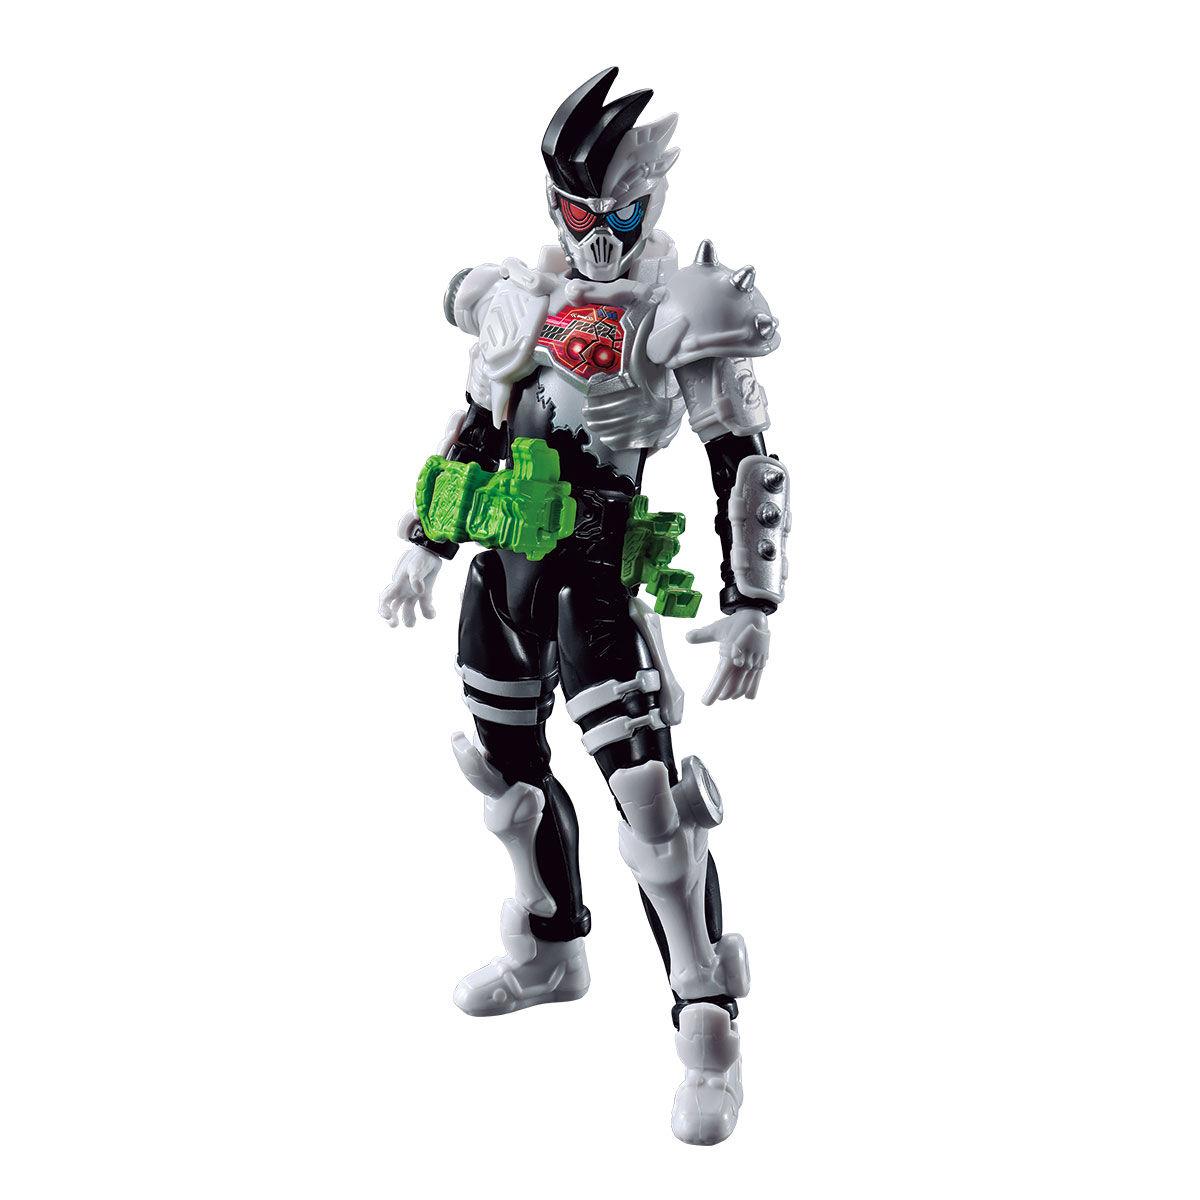 RKFレジェンドライダーシリーズ『仮面ライダーゲンム ゾンビゲーマー』可動フィギュア-001